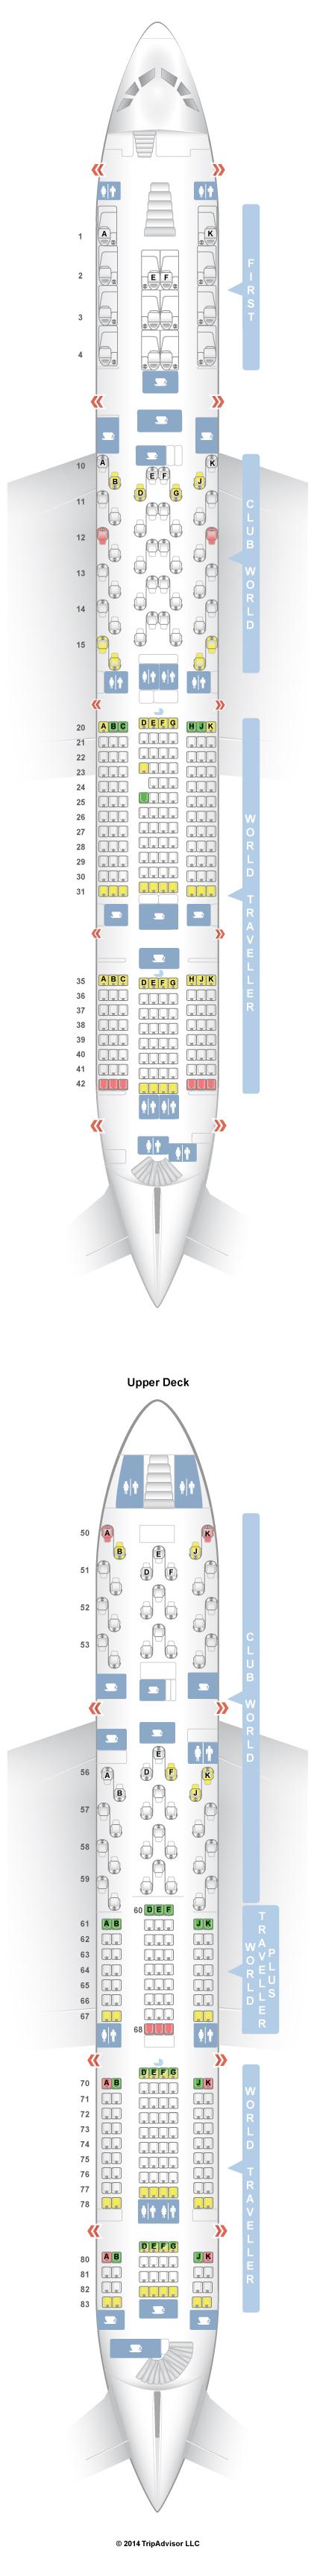 SeatGuru Seat Map British Airways Airbus A380-800 (388 ...